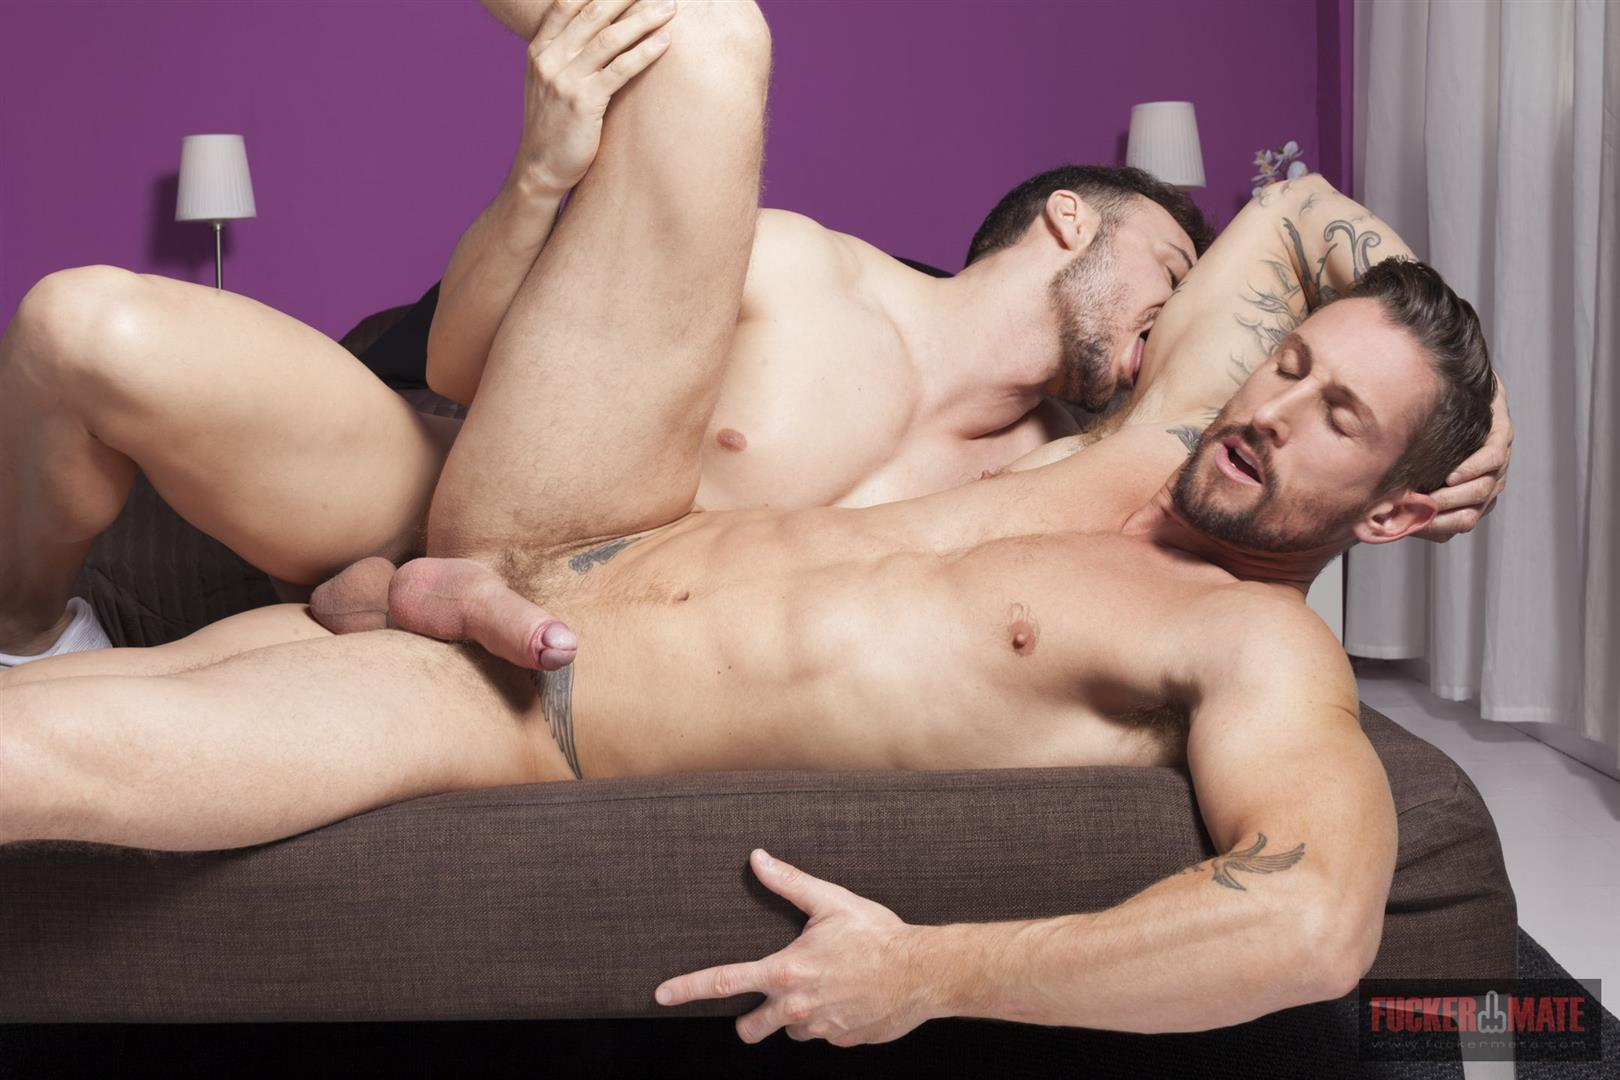 Fuckermate-Nick-North-and-Gabriel-Vanderloo-Muscle-Hunks-With-Big-Uncut-Cocks-Amateur-Gay-Porn-13 European Muscle Hunks Flip Flop Fucking With Their Big Uncut Cocks